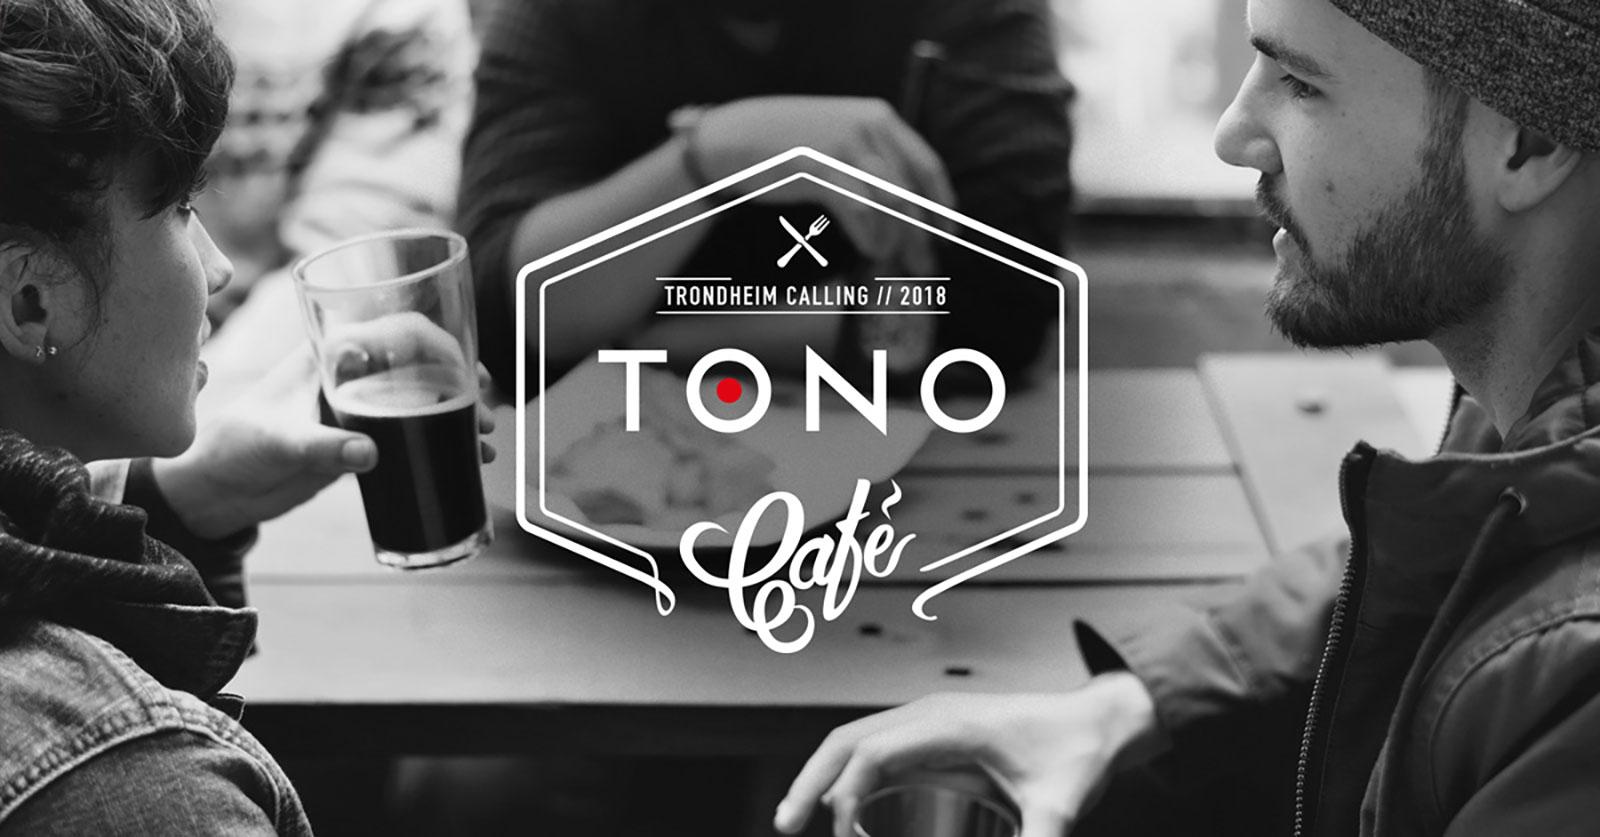 TONO_Cafe_TC_1600